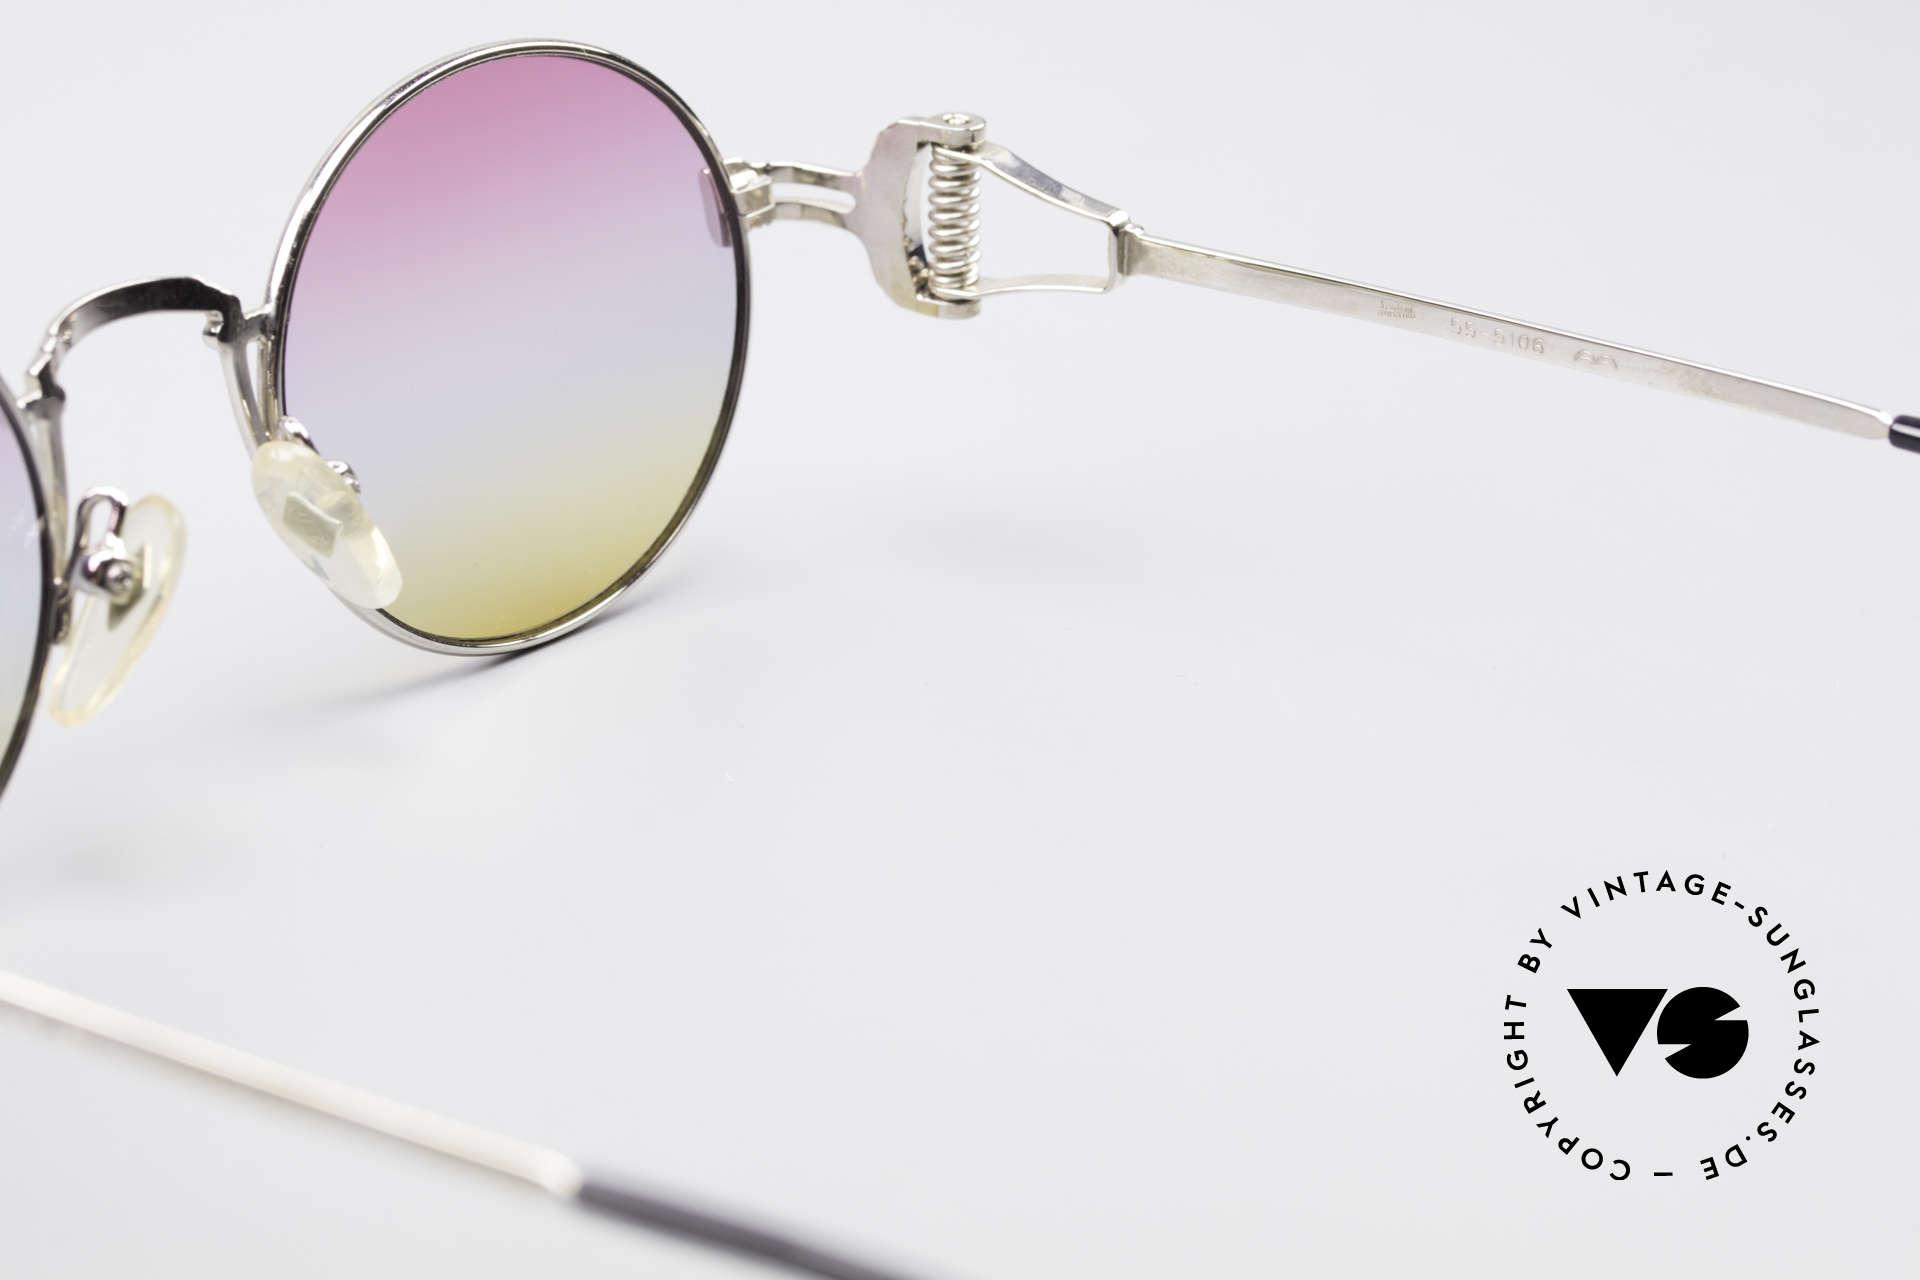 Jean Paul Gaultier 55-5106 Designer Vintage Shades, unworn (like all our rare old 1990's designer sunglasses), Made for Men and Women